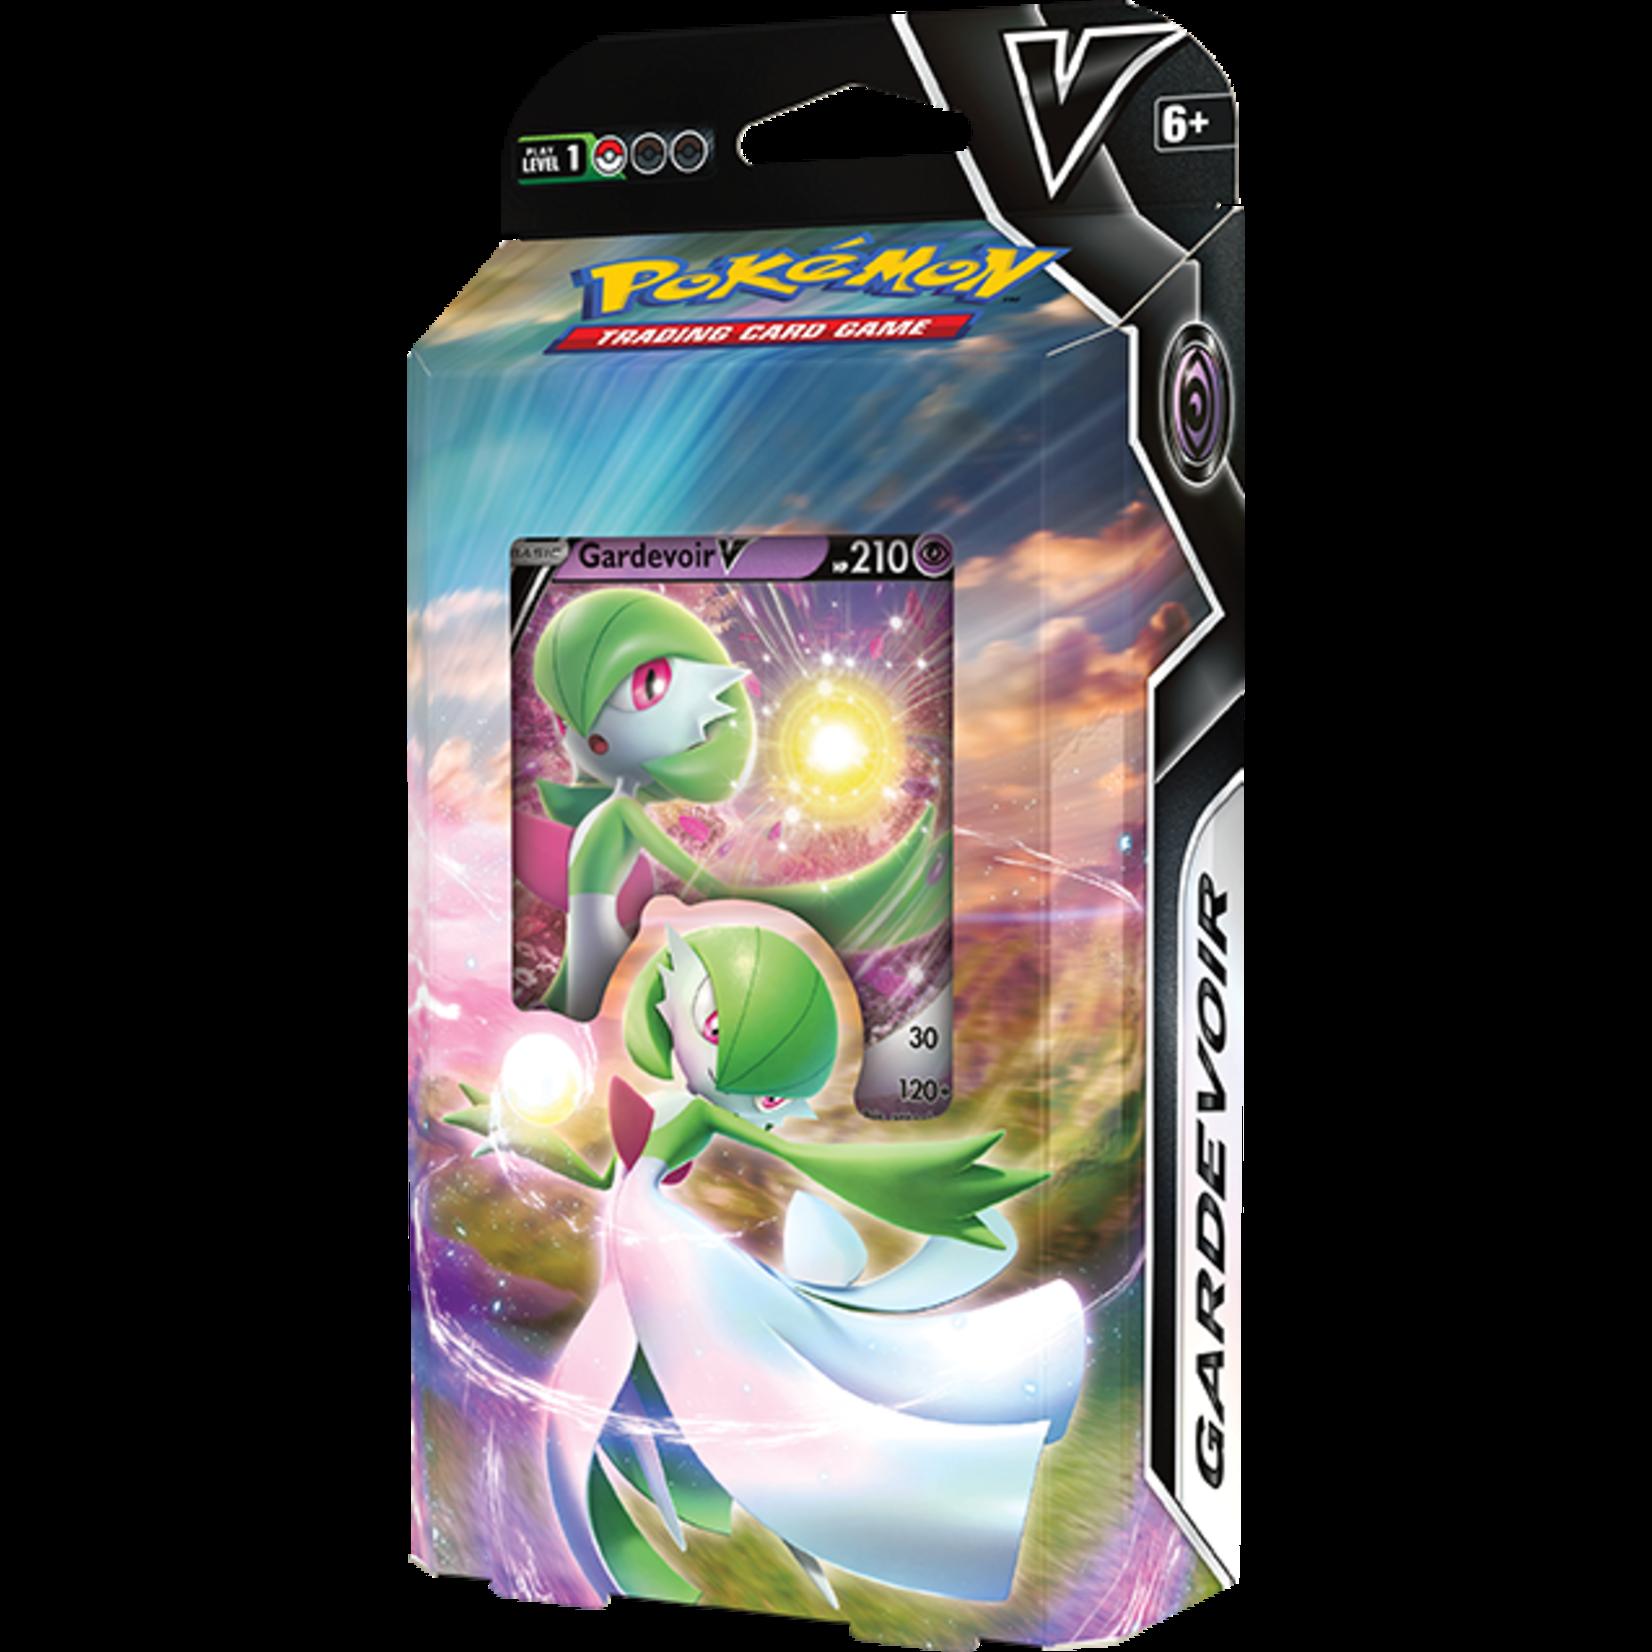 Pokémon Pokémon TCG: Gardevoir V Battle Deck